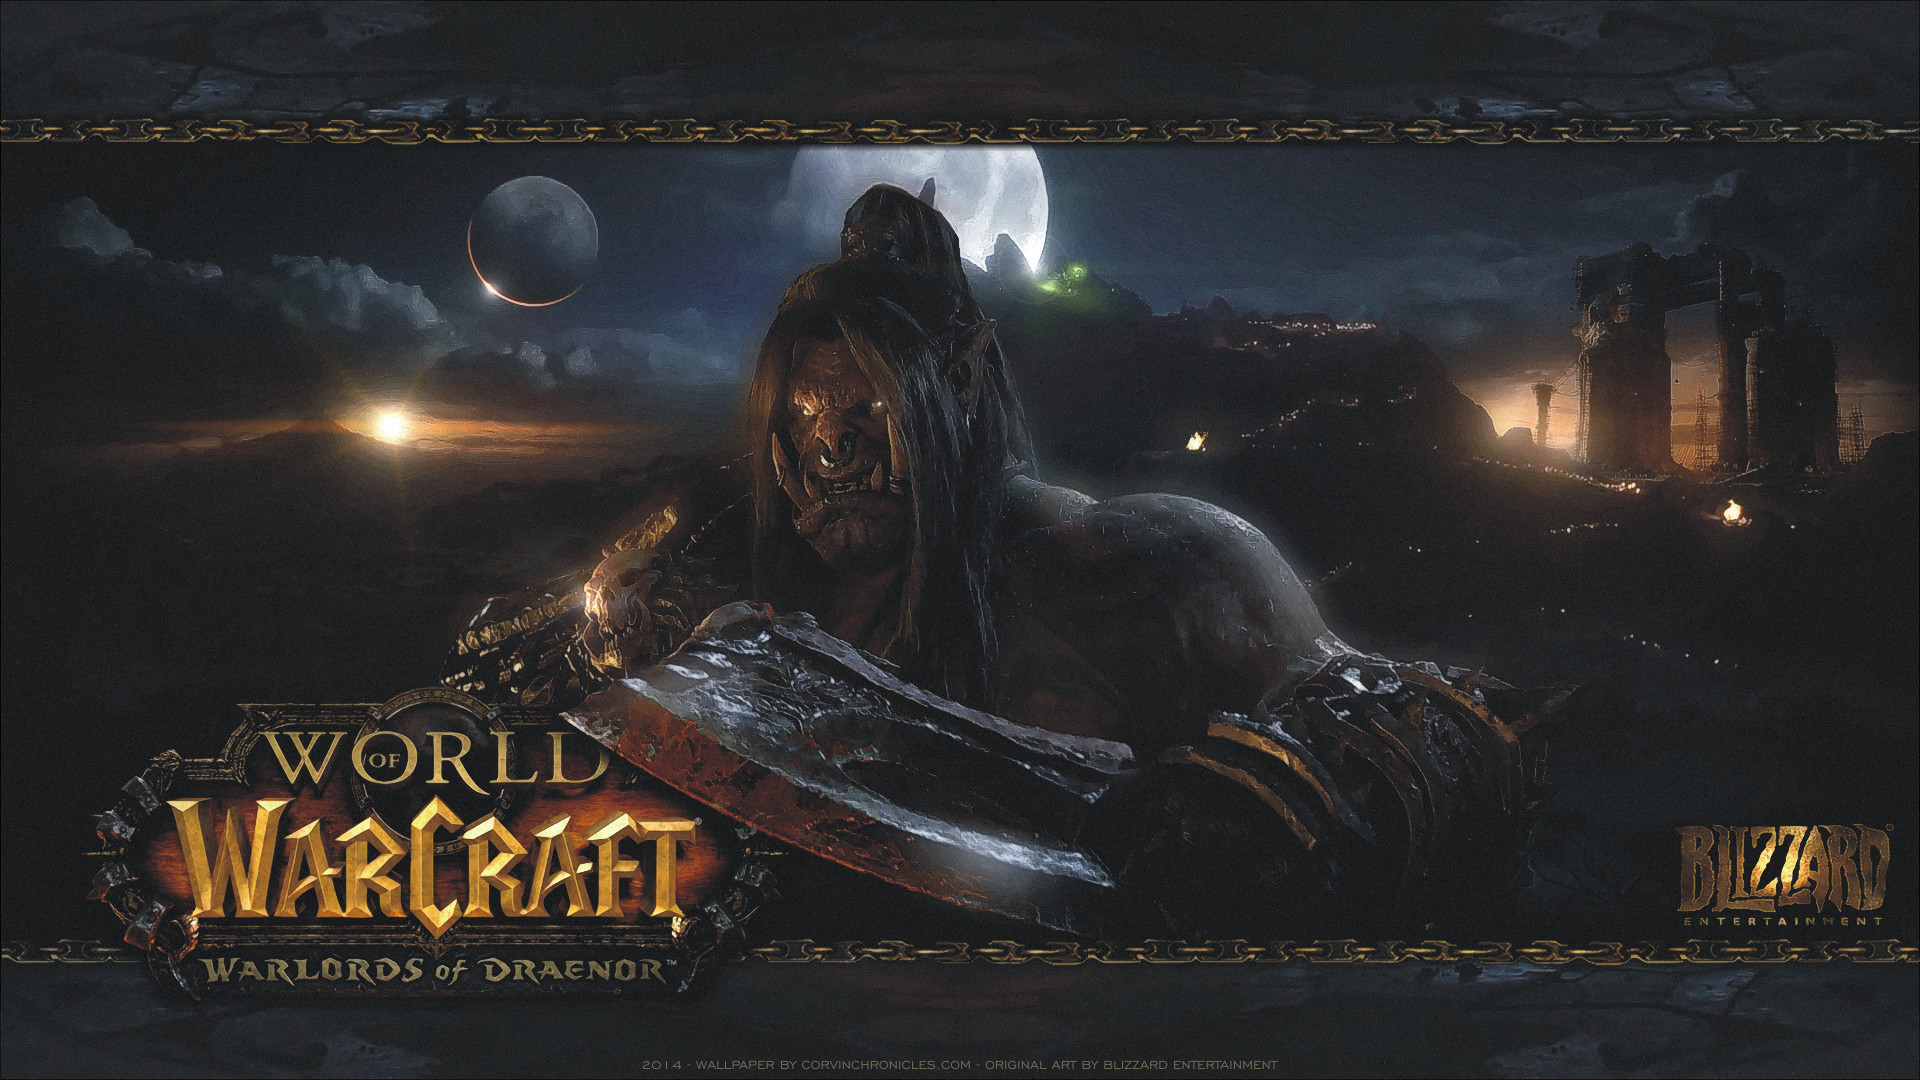 World Of Warcraft Priest Wallpaper (73+ Images